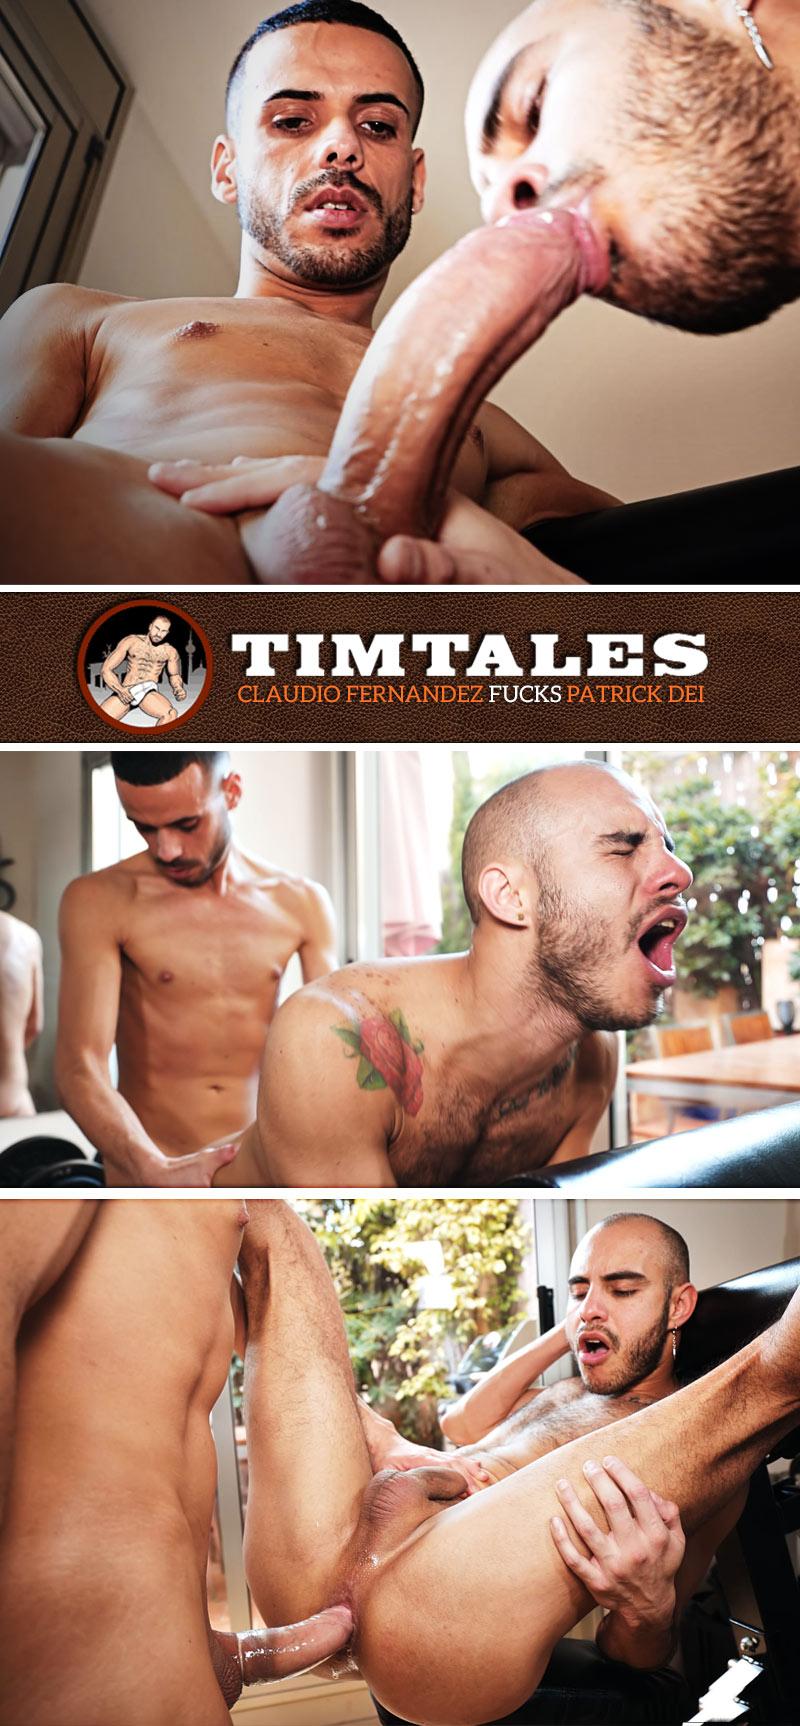 Claudio Fernandez Fucks Patrick Dei at TimTales